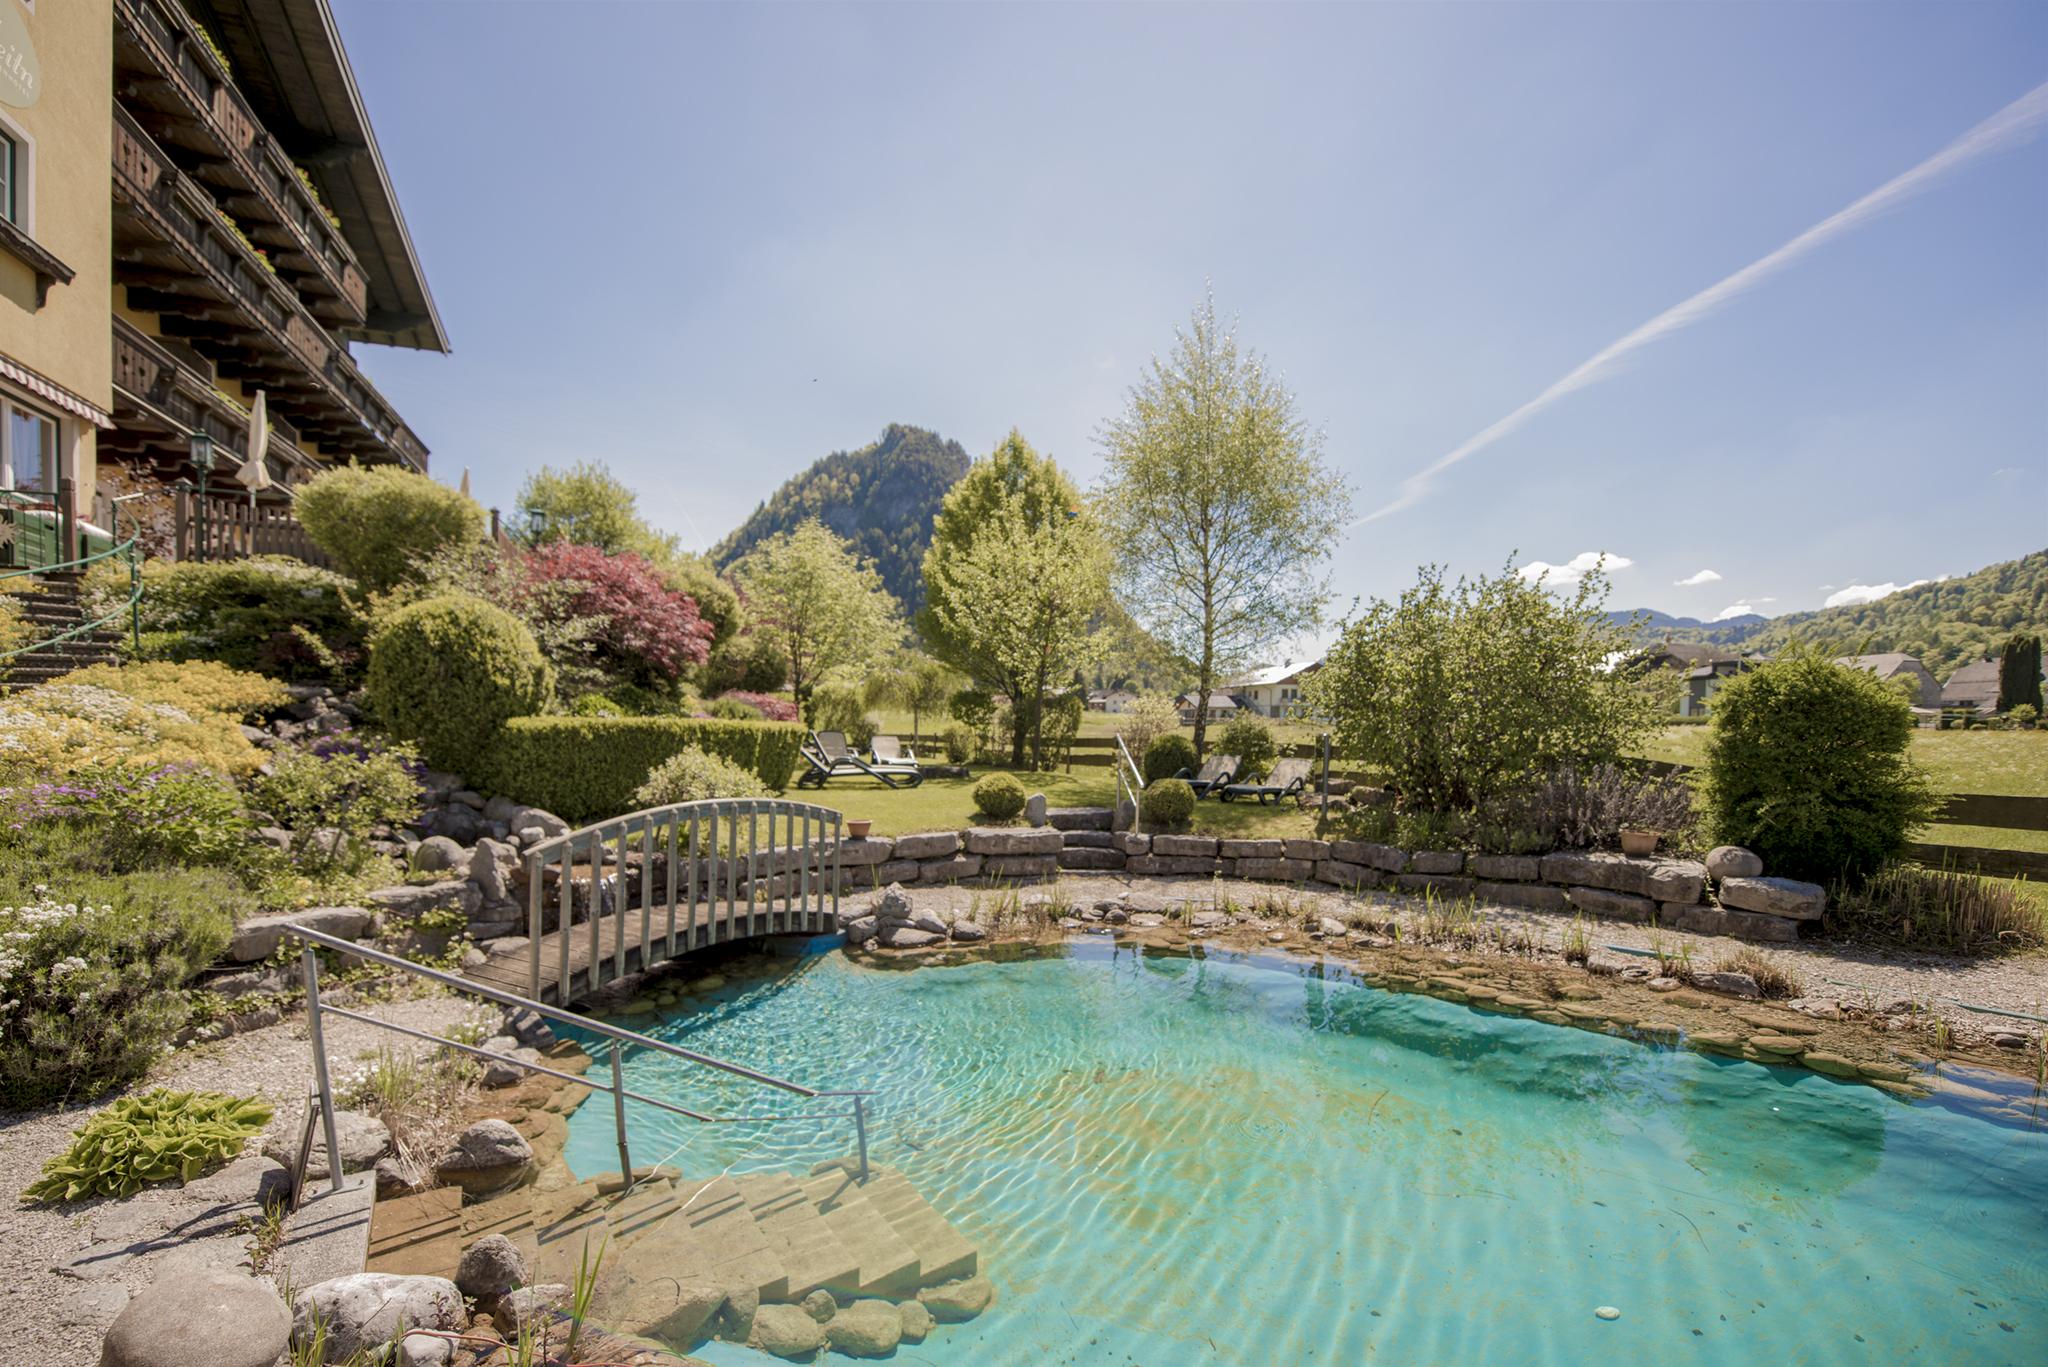 Naturschwimmteich © Hotel Sonnleitn